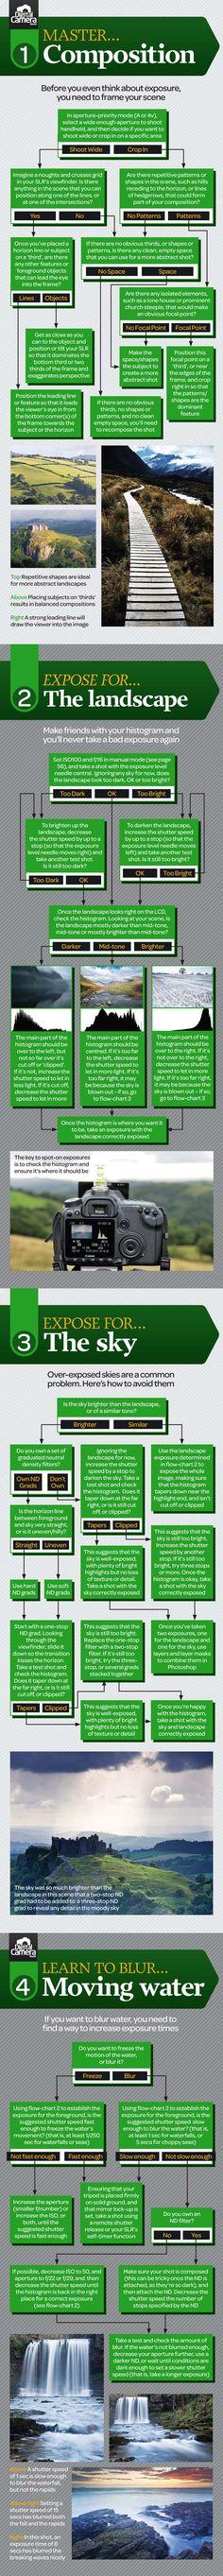 landscape-photography.jpg (610×7047)